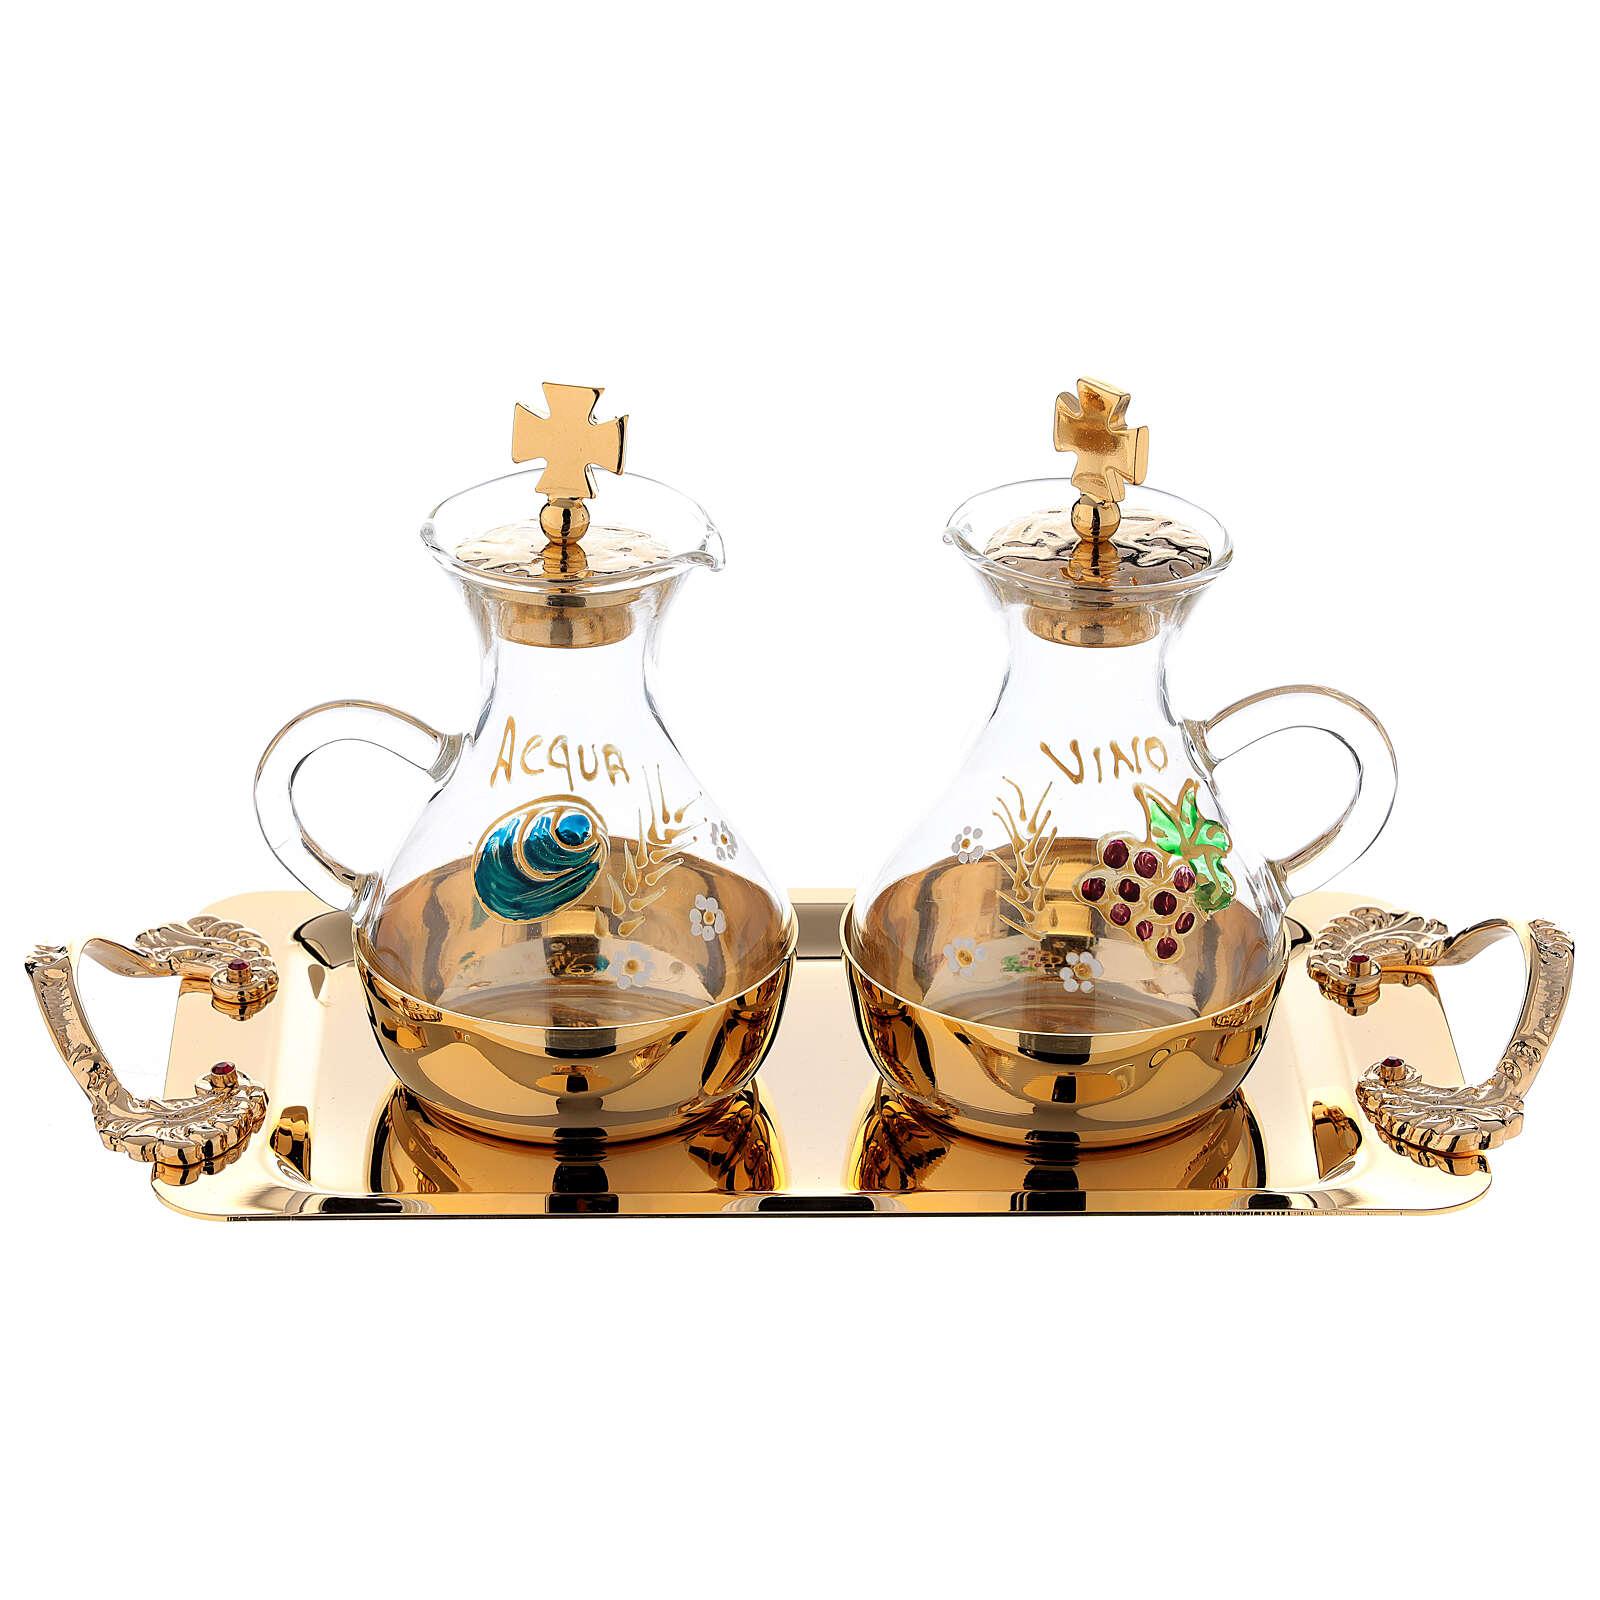 Hand painted cruet set in gold plated brass 4